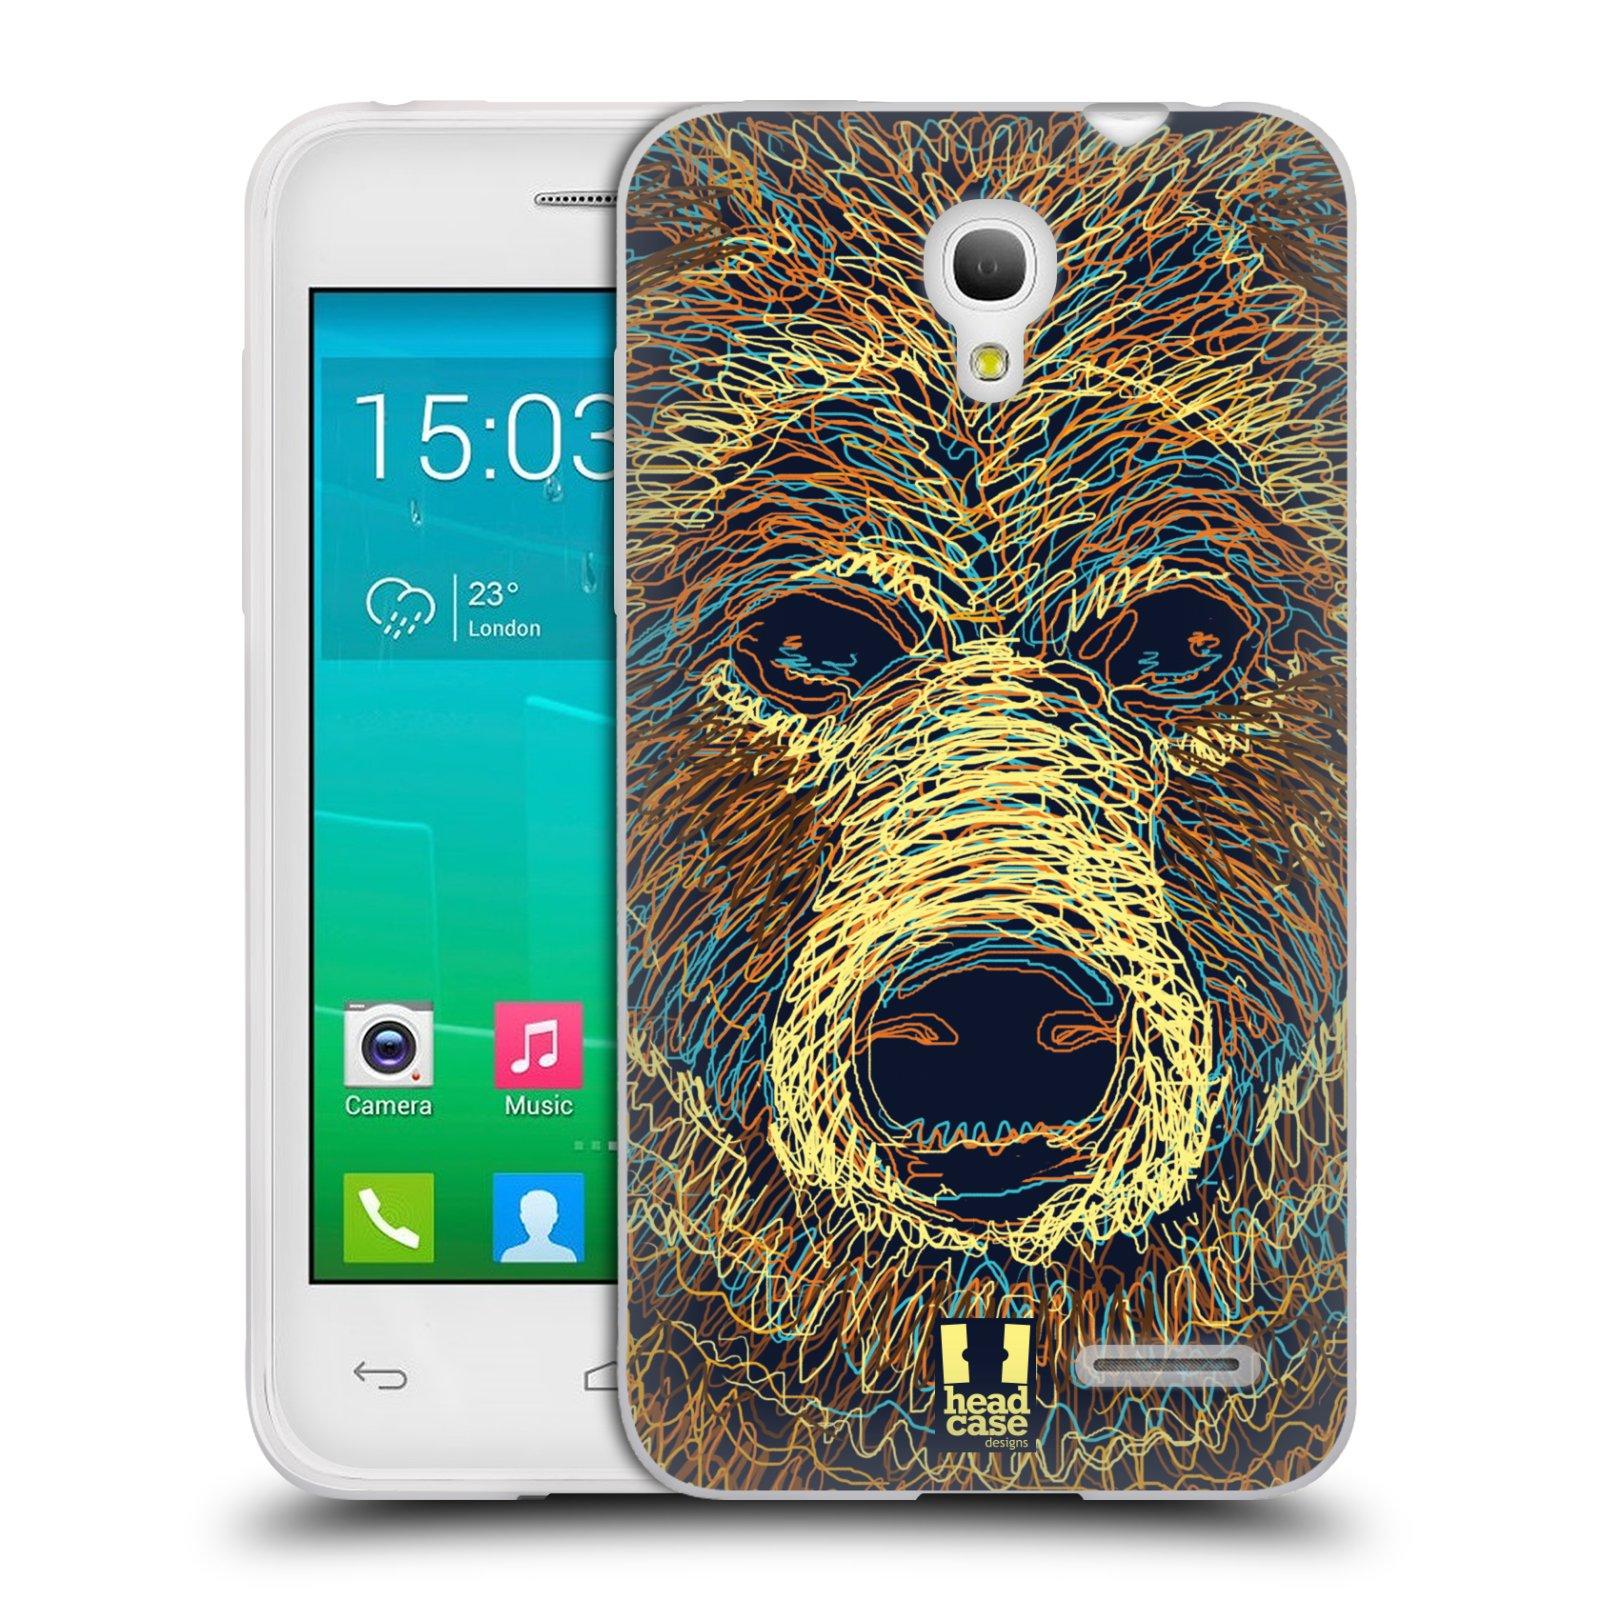 HEAD CASE silikonový obal na mobil Alcatel POP S3 OT-5050Y vzor zvíře čmáranice medvěd